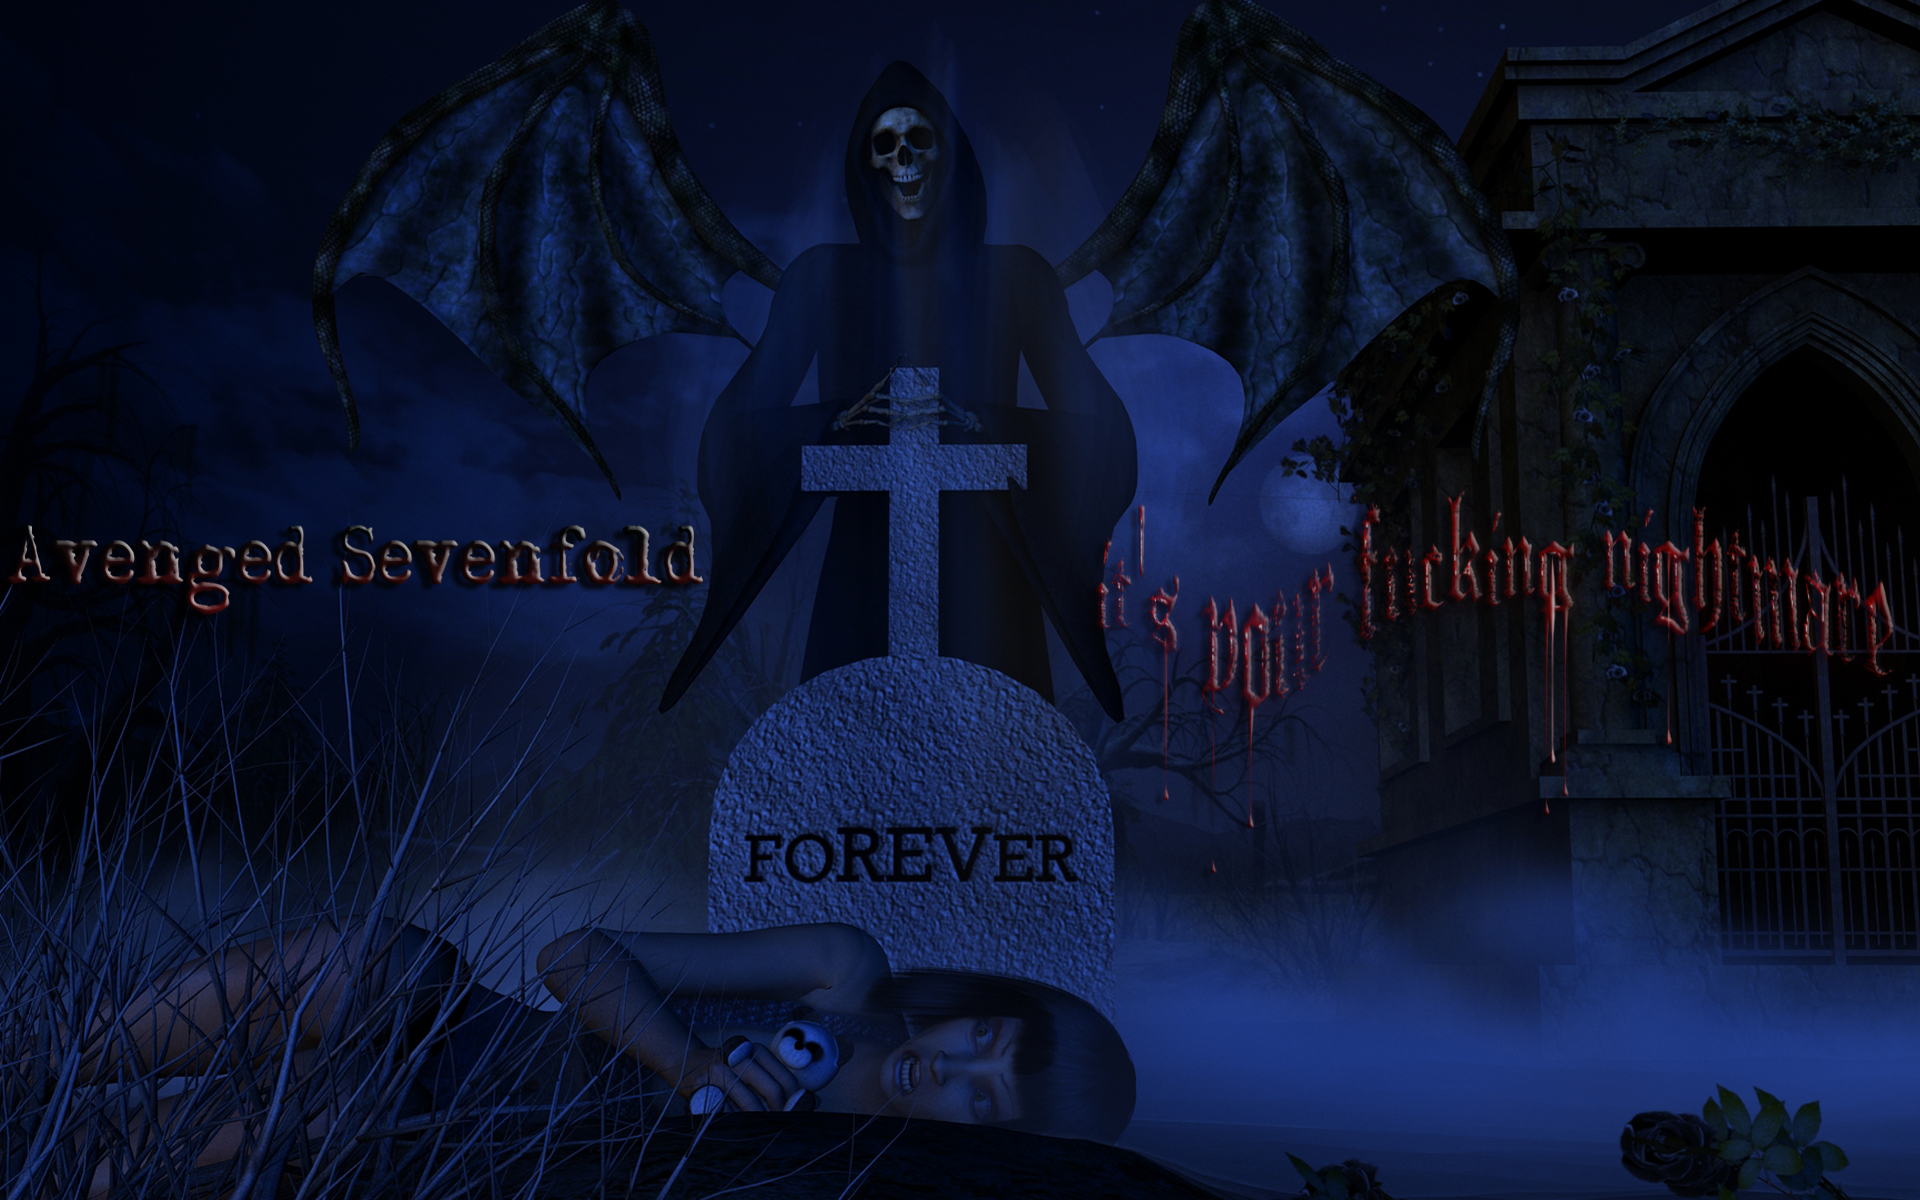 Avenged Sevenfold HD Wallpaper Background Image